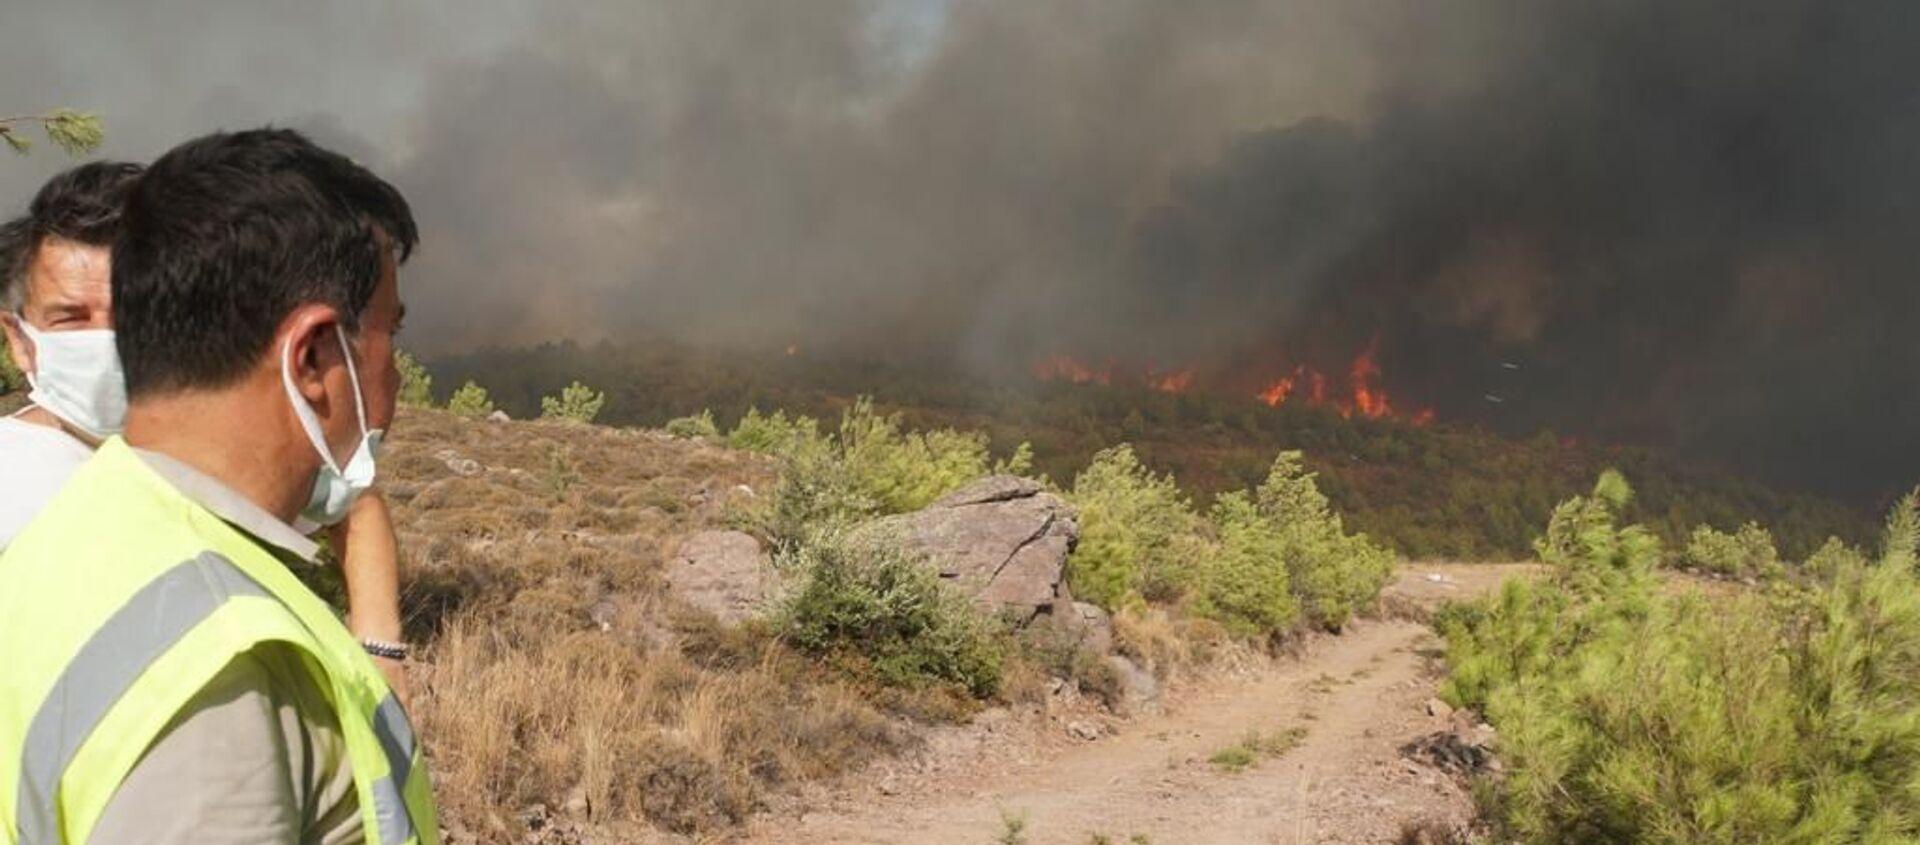 Wildfires raging near the town of Bodrum, Turkey - Sputnik International, 1920, 31.07.2021